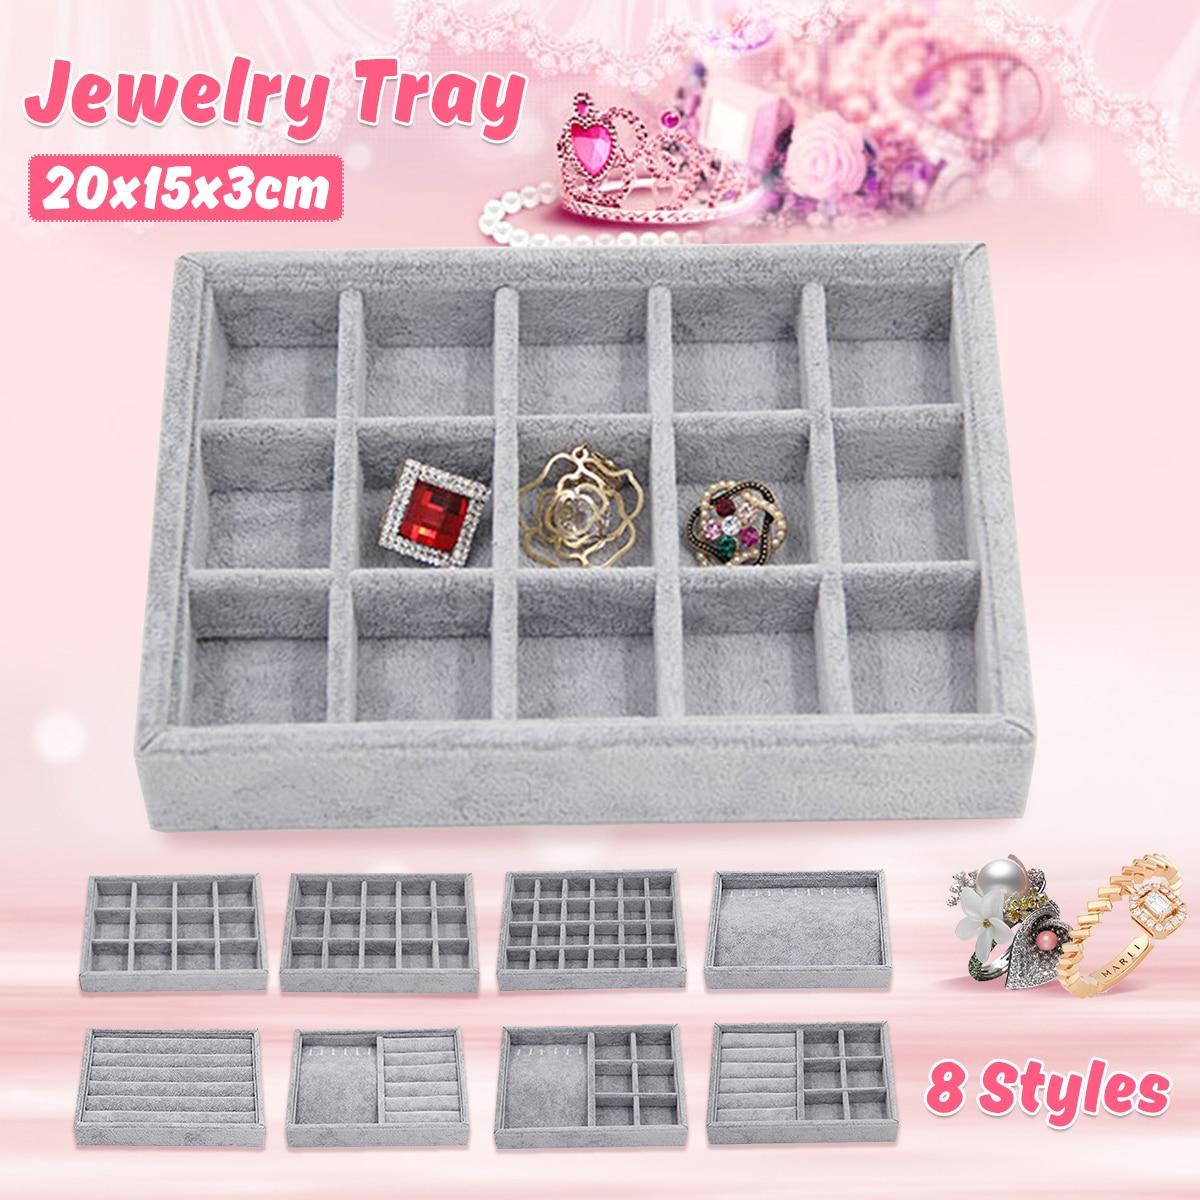 8 Style Elegant Grey Velvet Stackable Jewelry Ring Earring Bracelet Display Tray 24 Girds Case Holder Organizers Storage Showcas